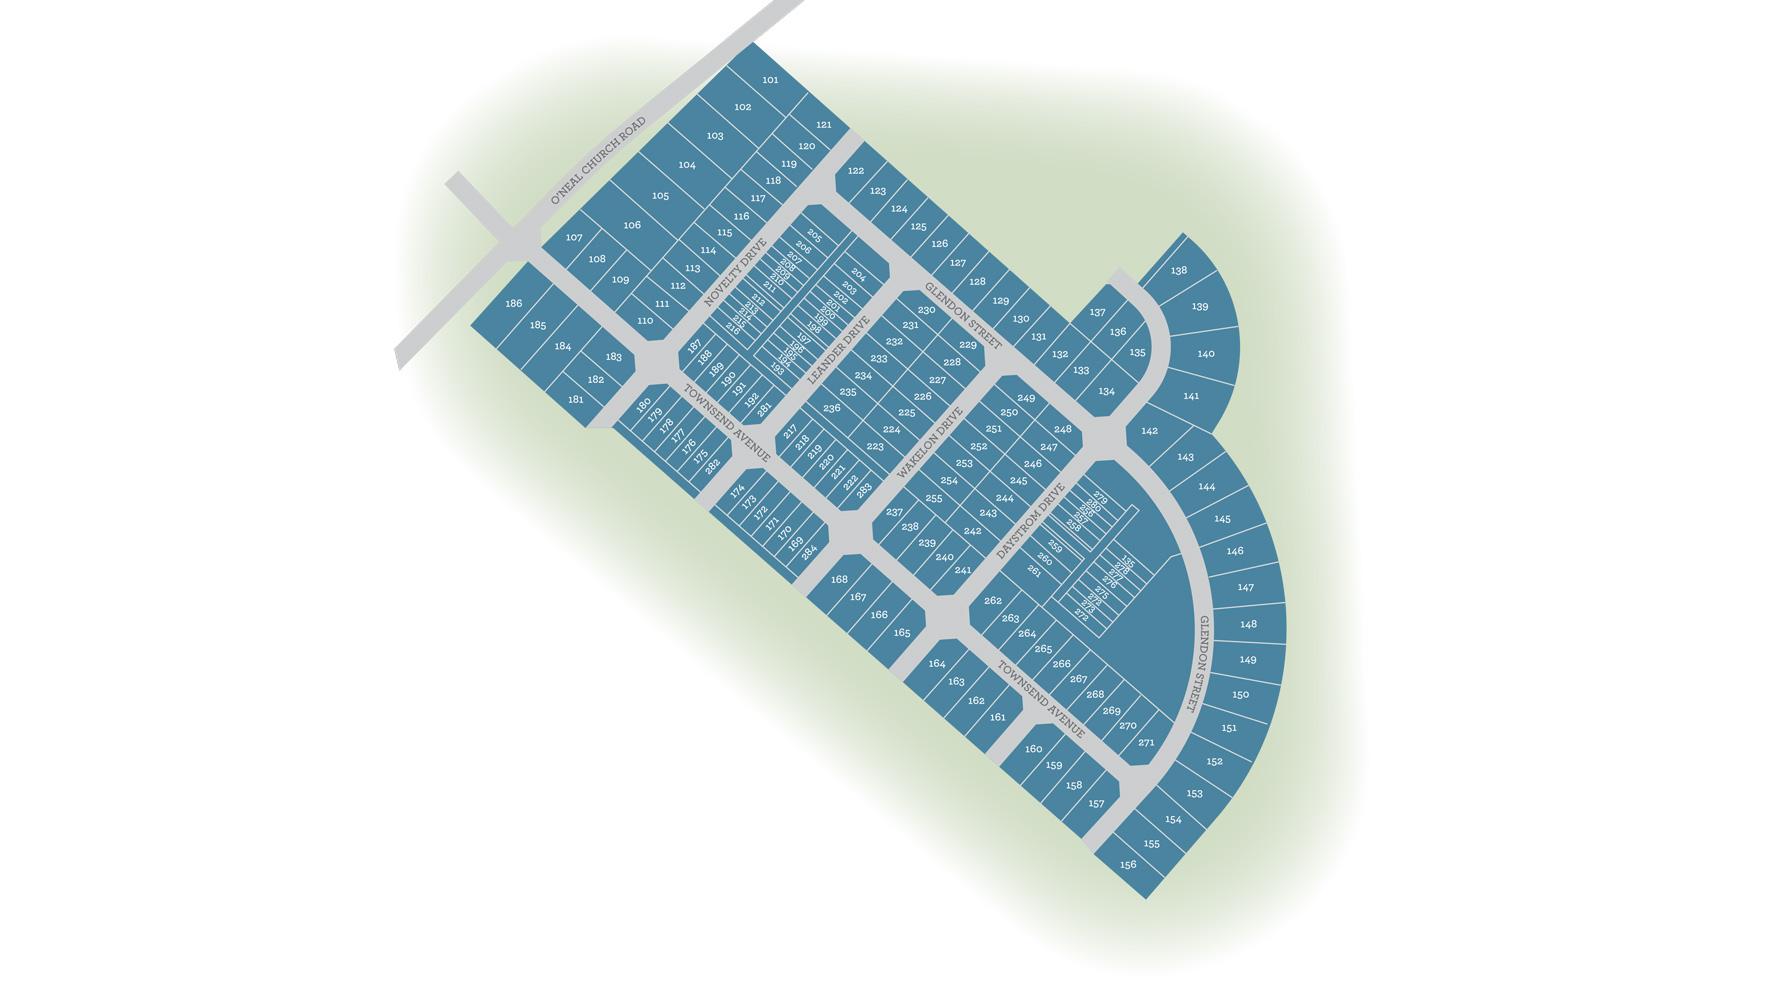 O'Neal Village Site Plan